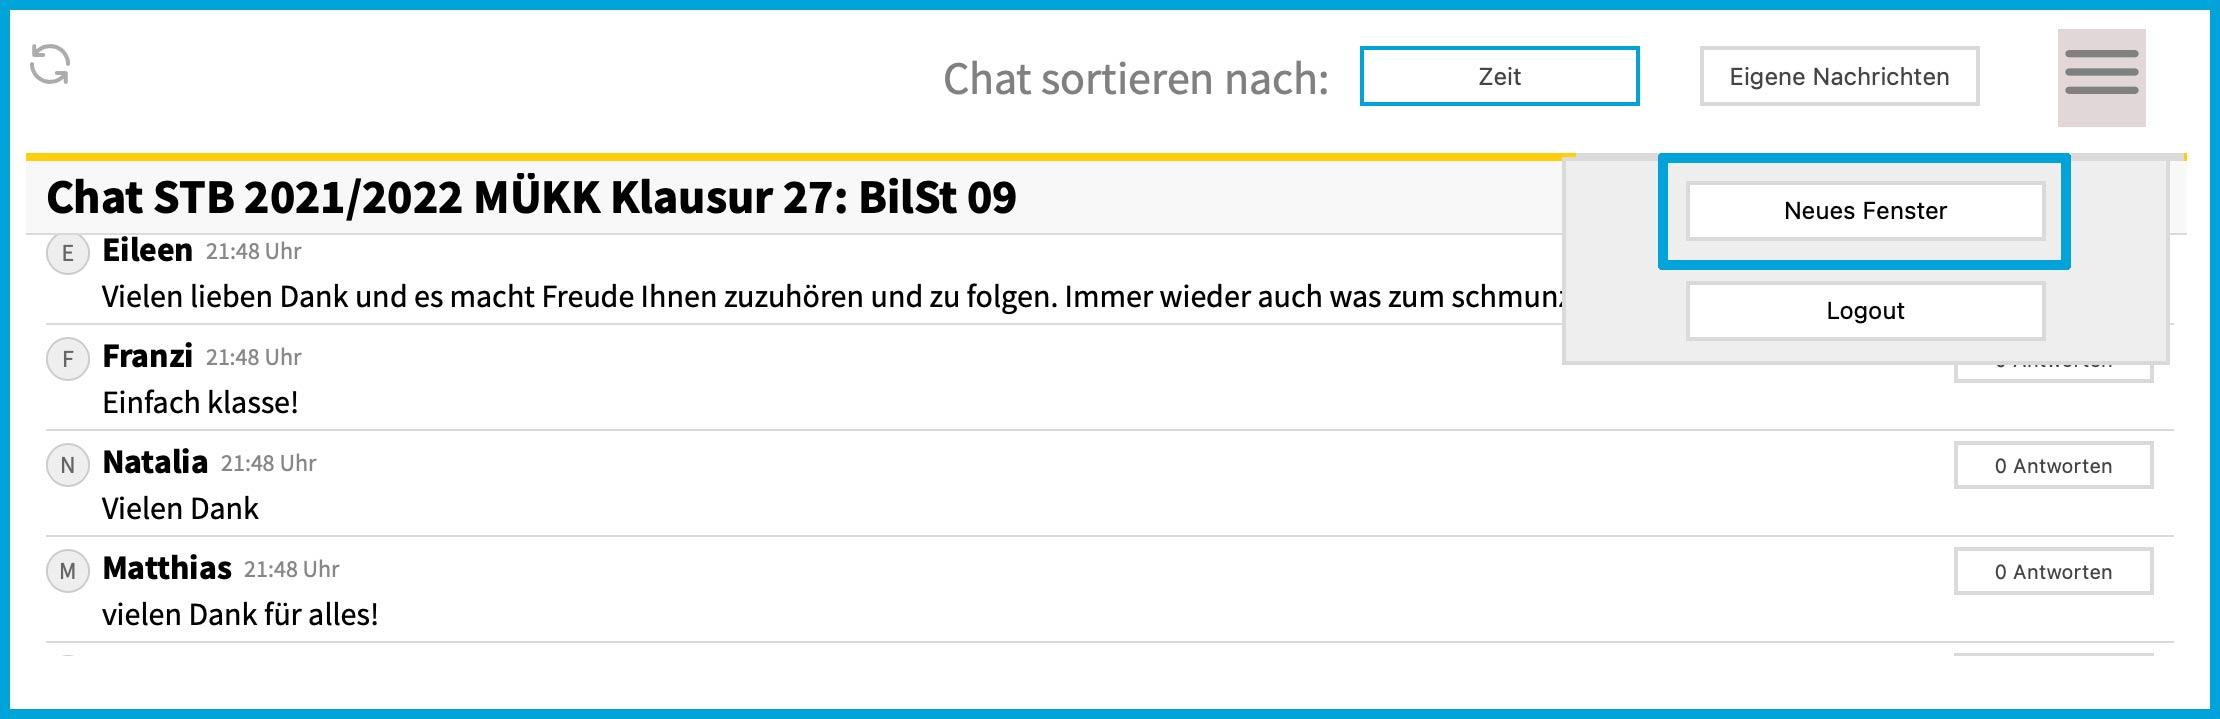 knoll_digital_chat032.jpg